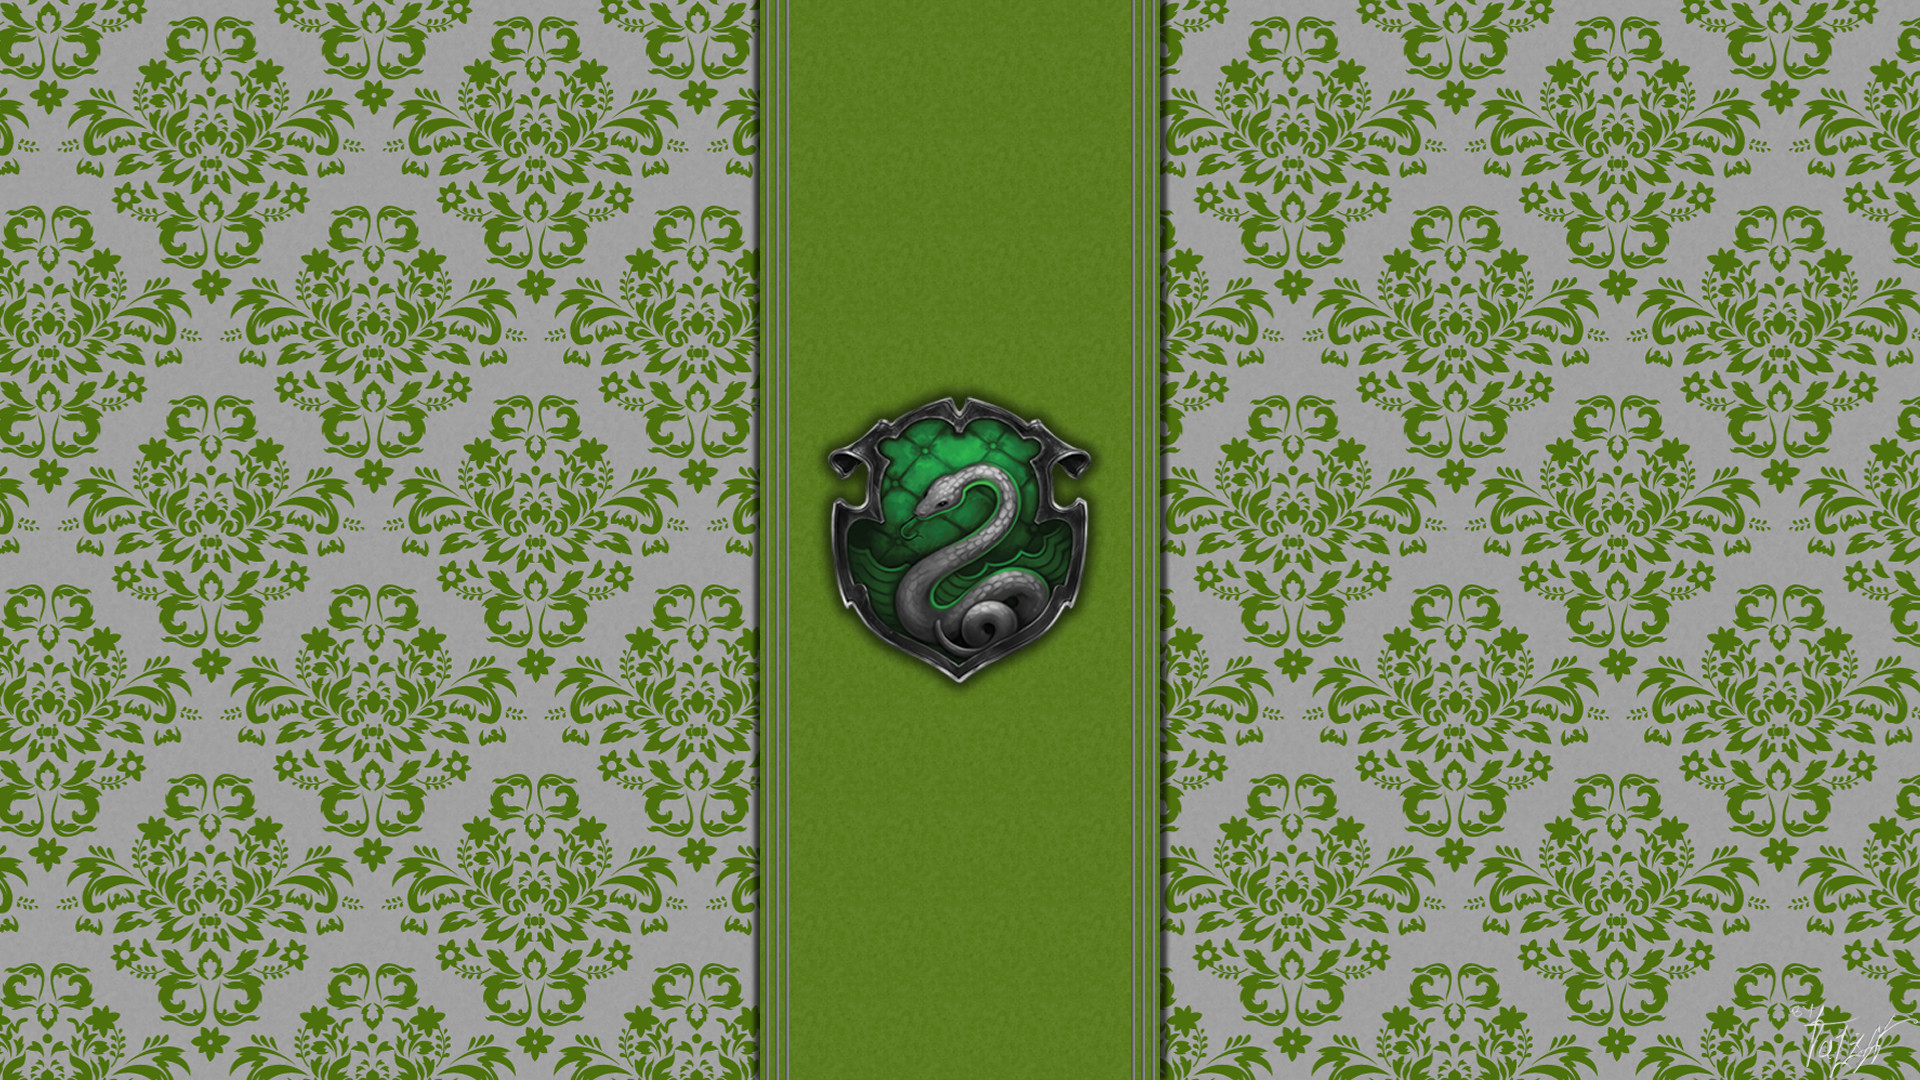 hogwarts_house_wallpaper___slytherin_by_theladyavatar-d4ol92u.jpg  (1920×1080) | Harry Potter and the Pinterest Board | Pinterest | Slytherin, Harry  potter …